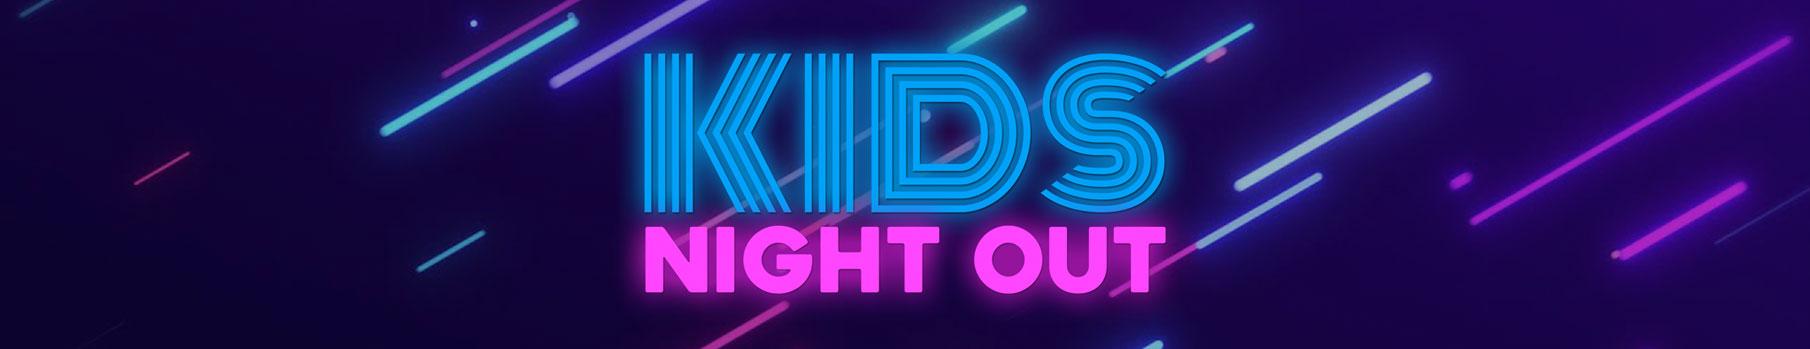 kidsnightout-sub-0321